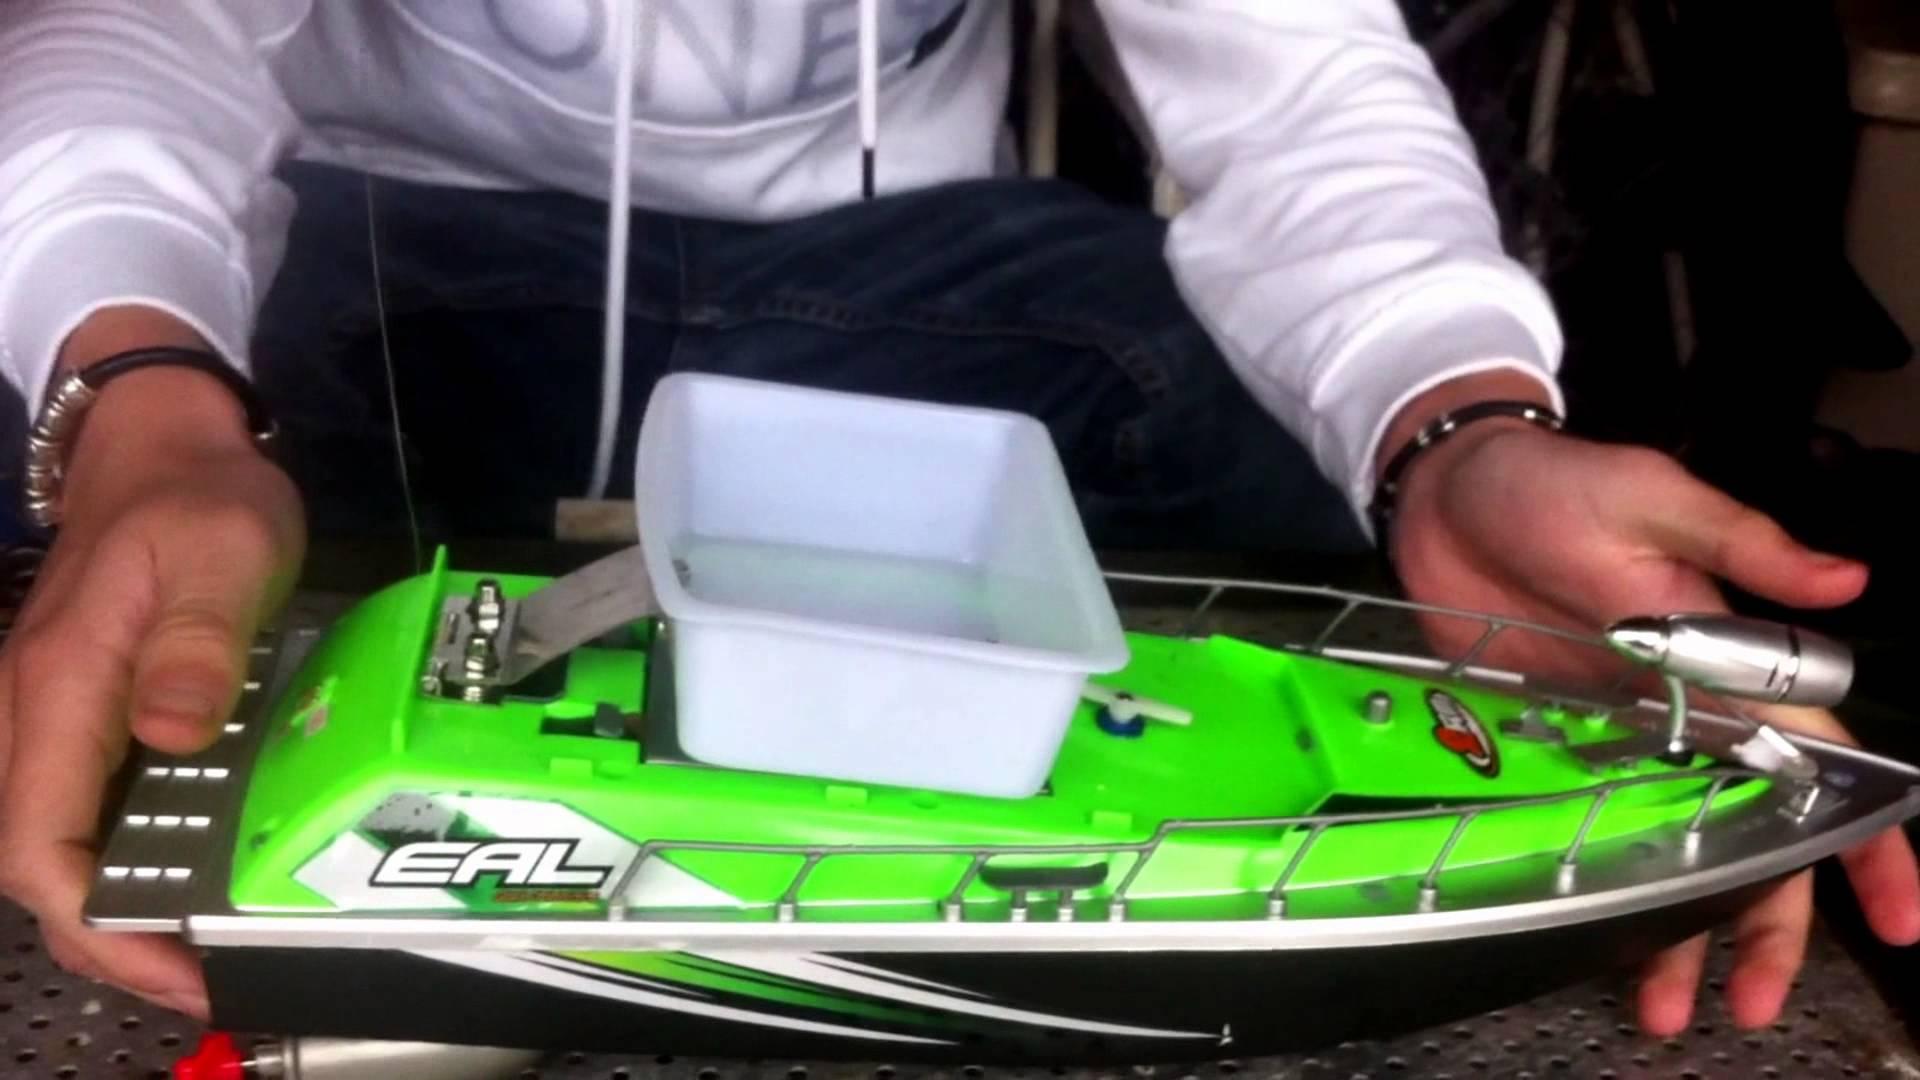 bateau amorceur radiocommande